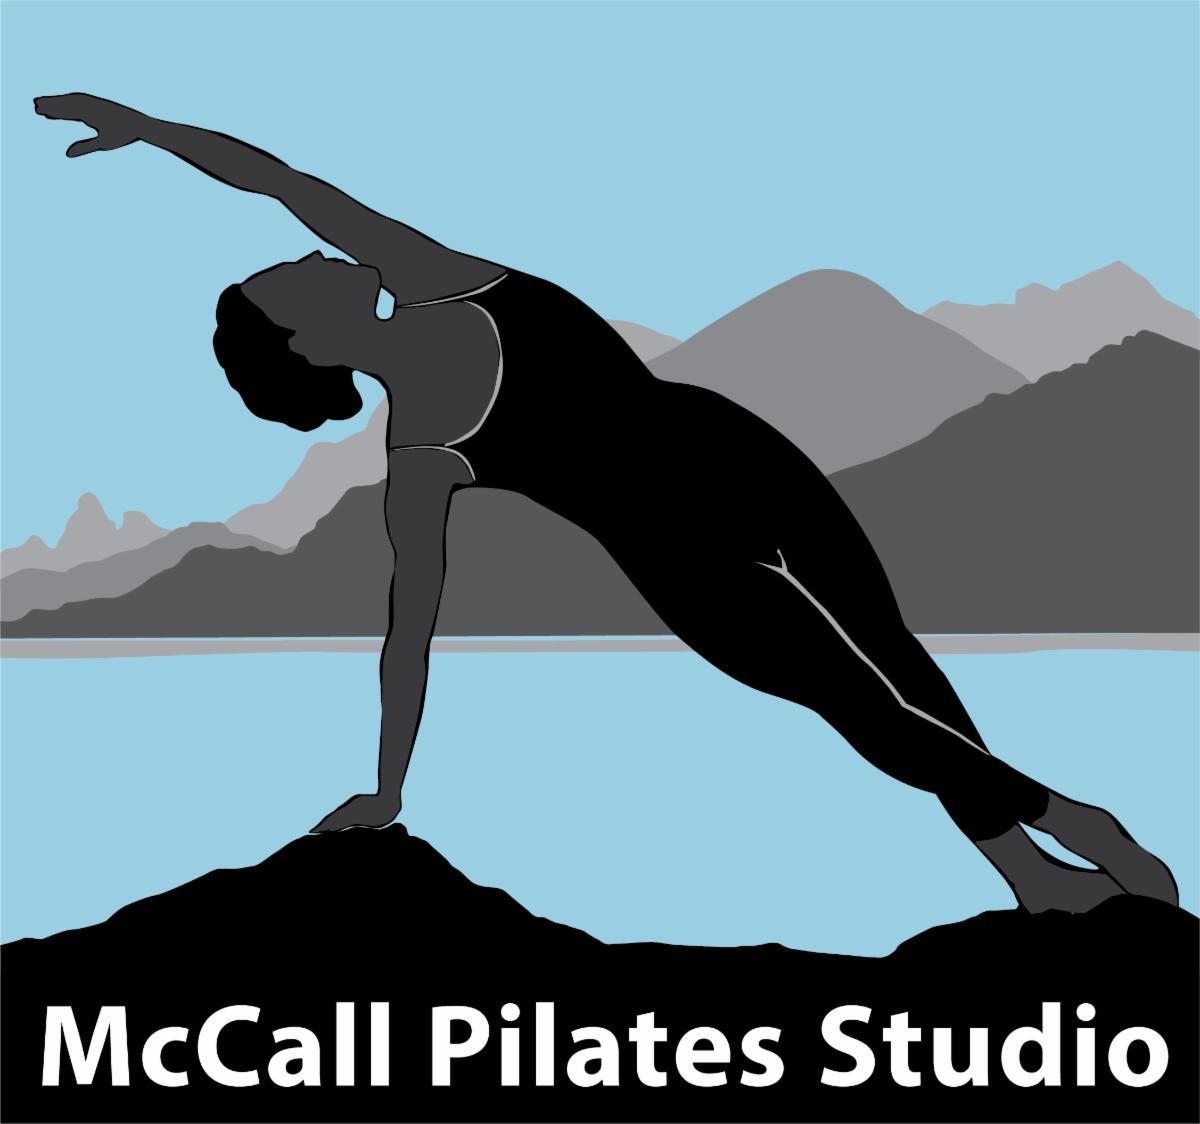 190522-McCall Pilates Studio-Blue Background.jpg